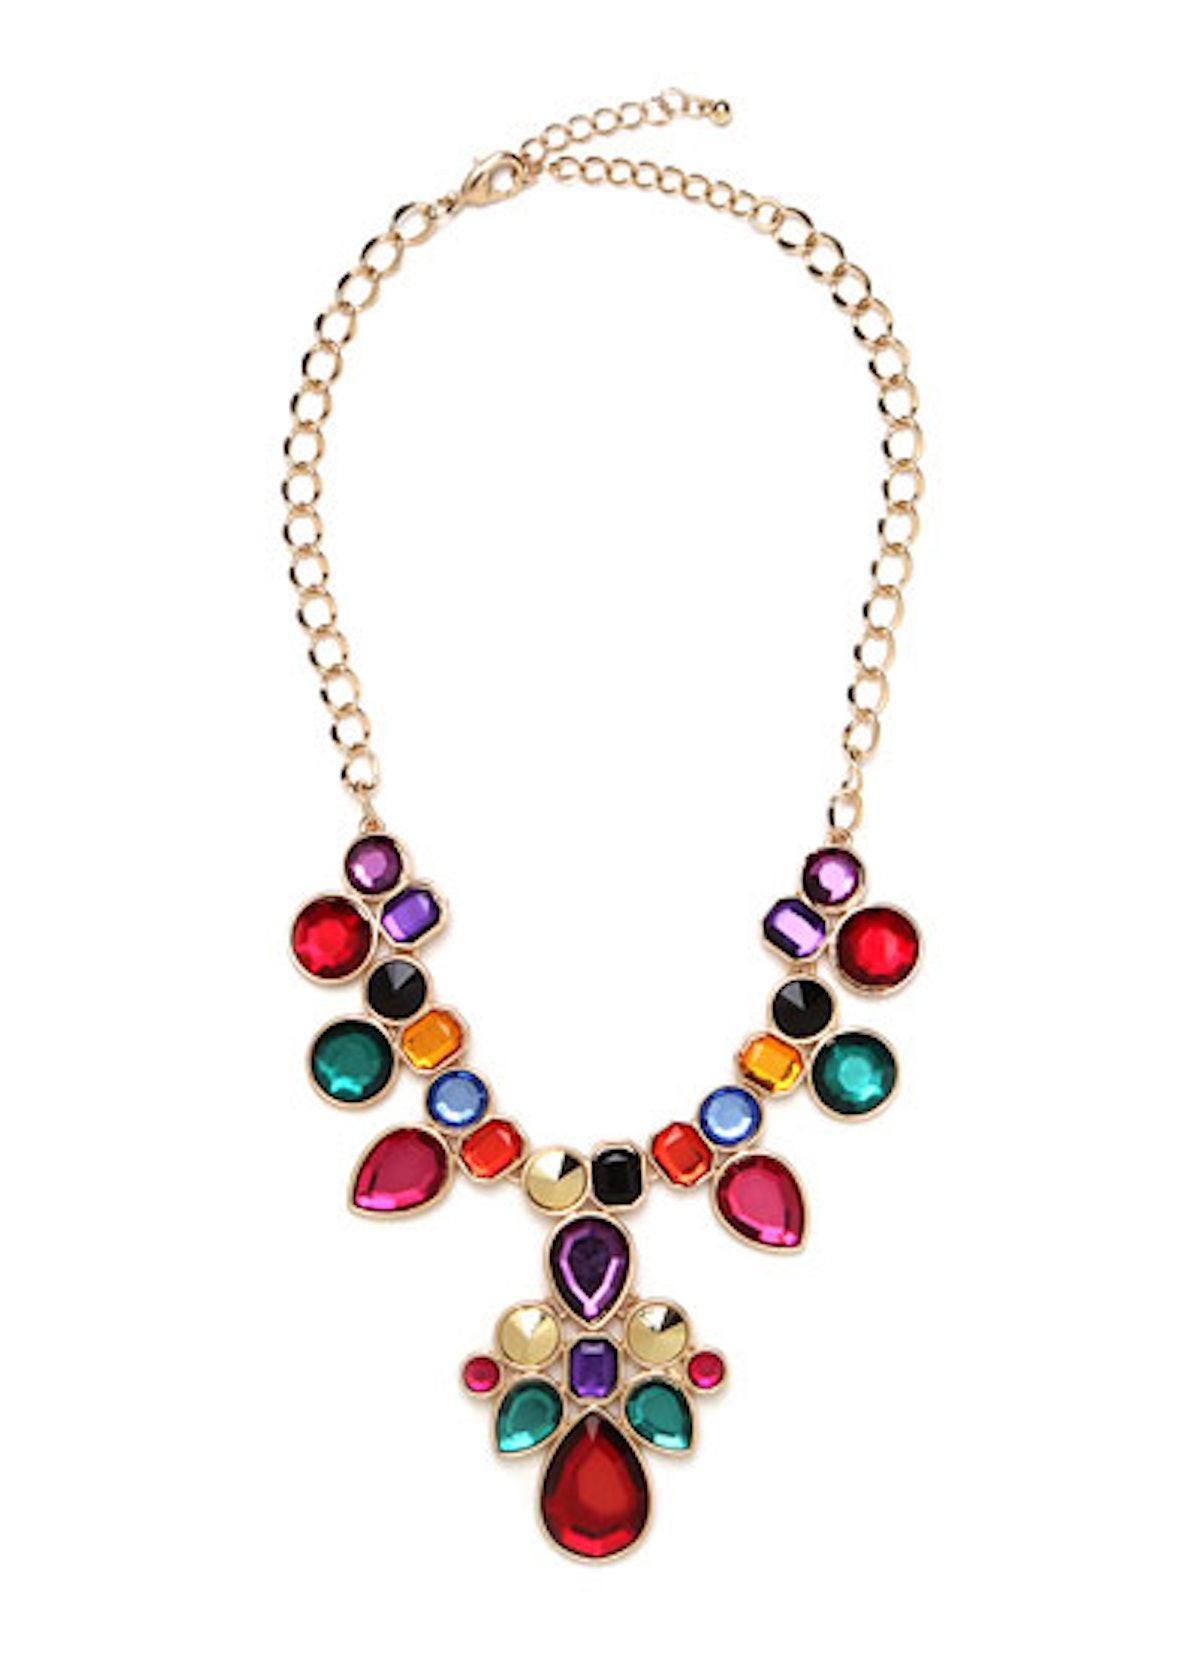 acss-decades-costume-jewelry-07-v.jpg